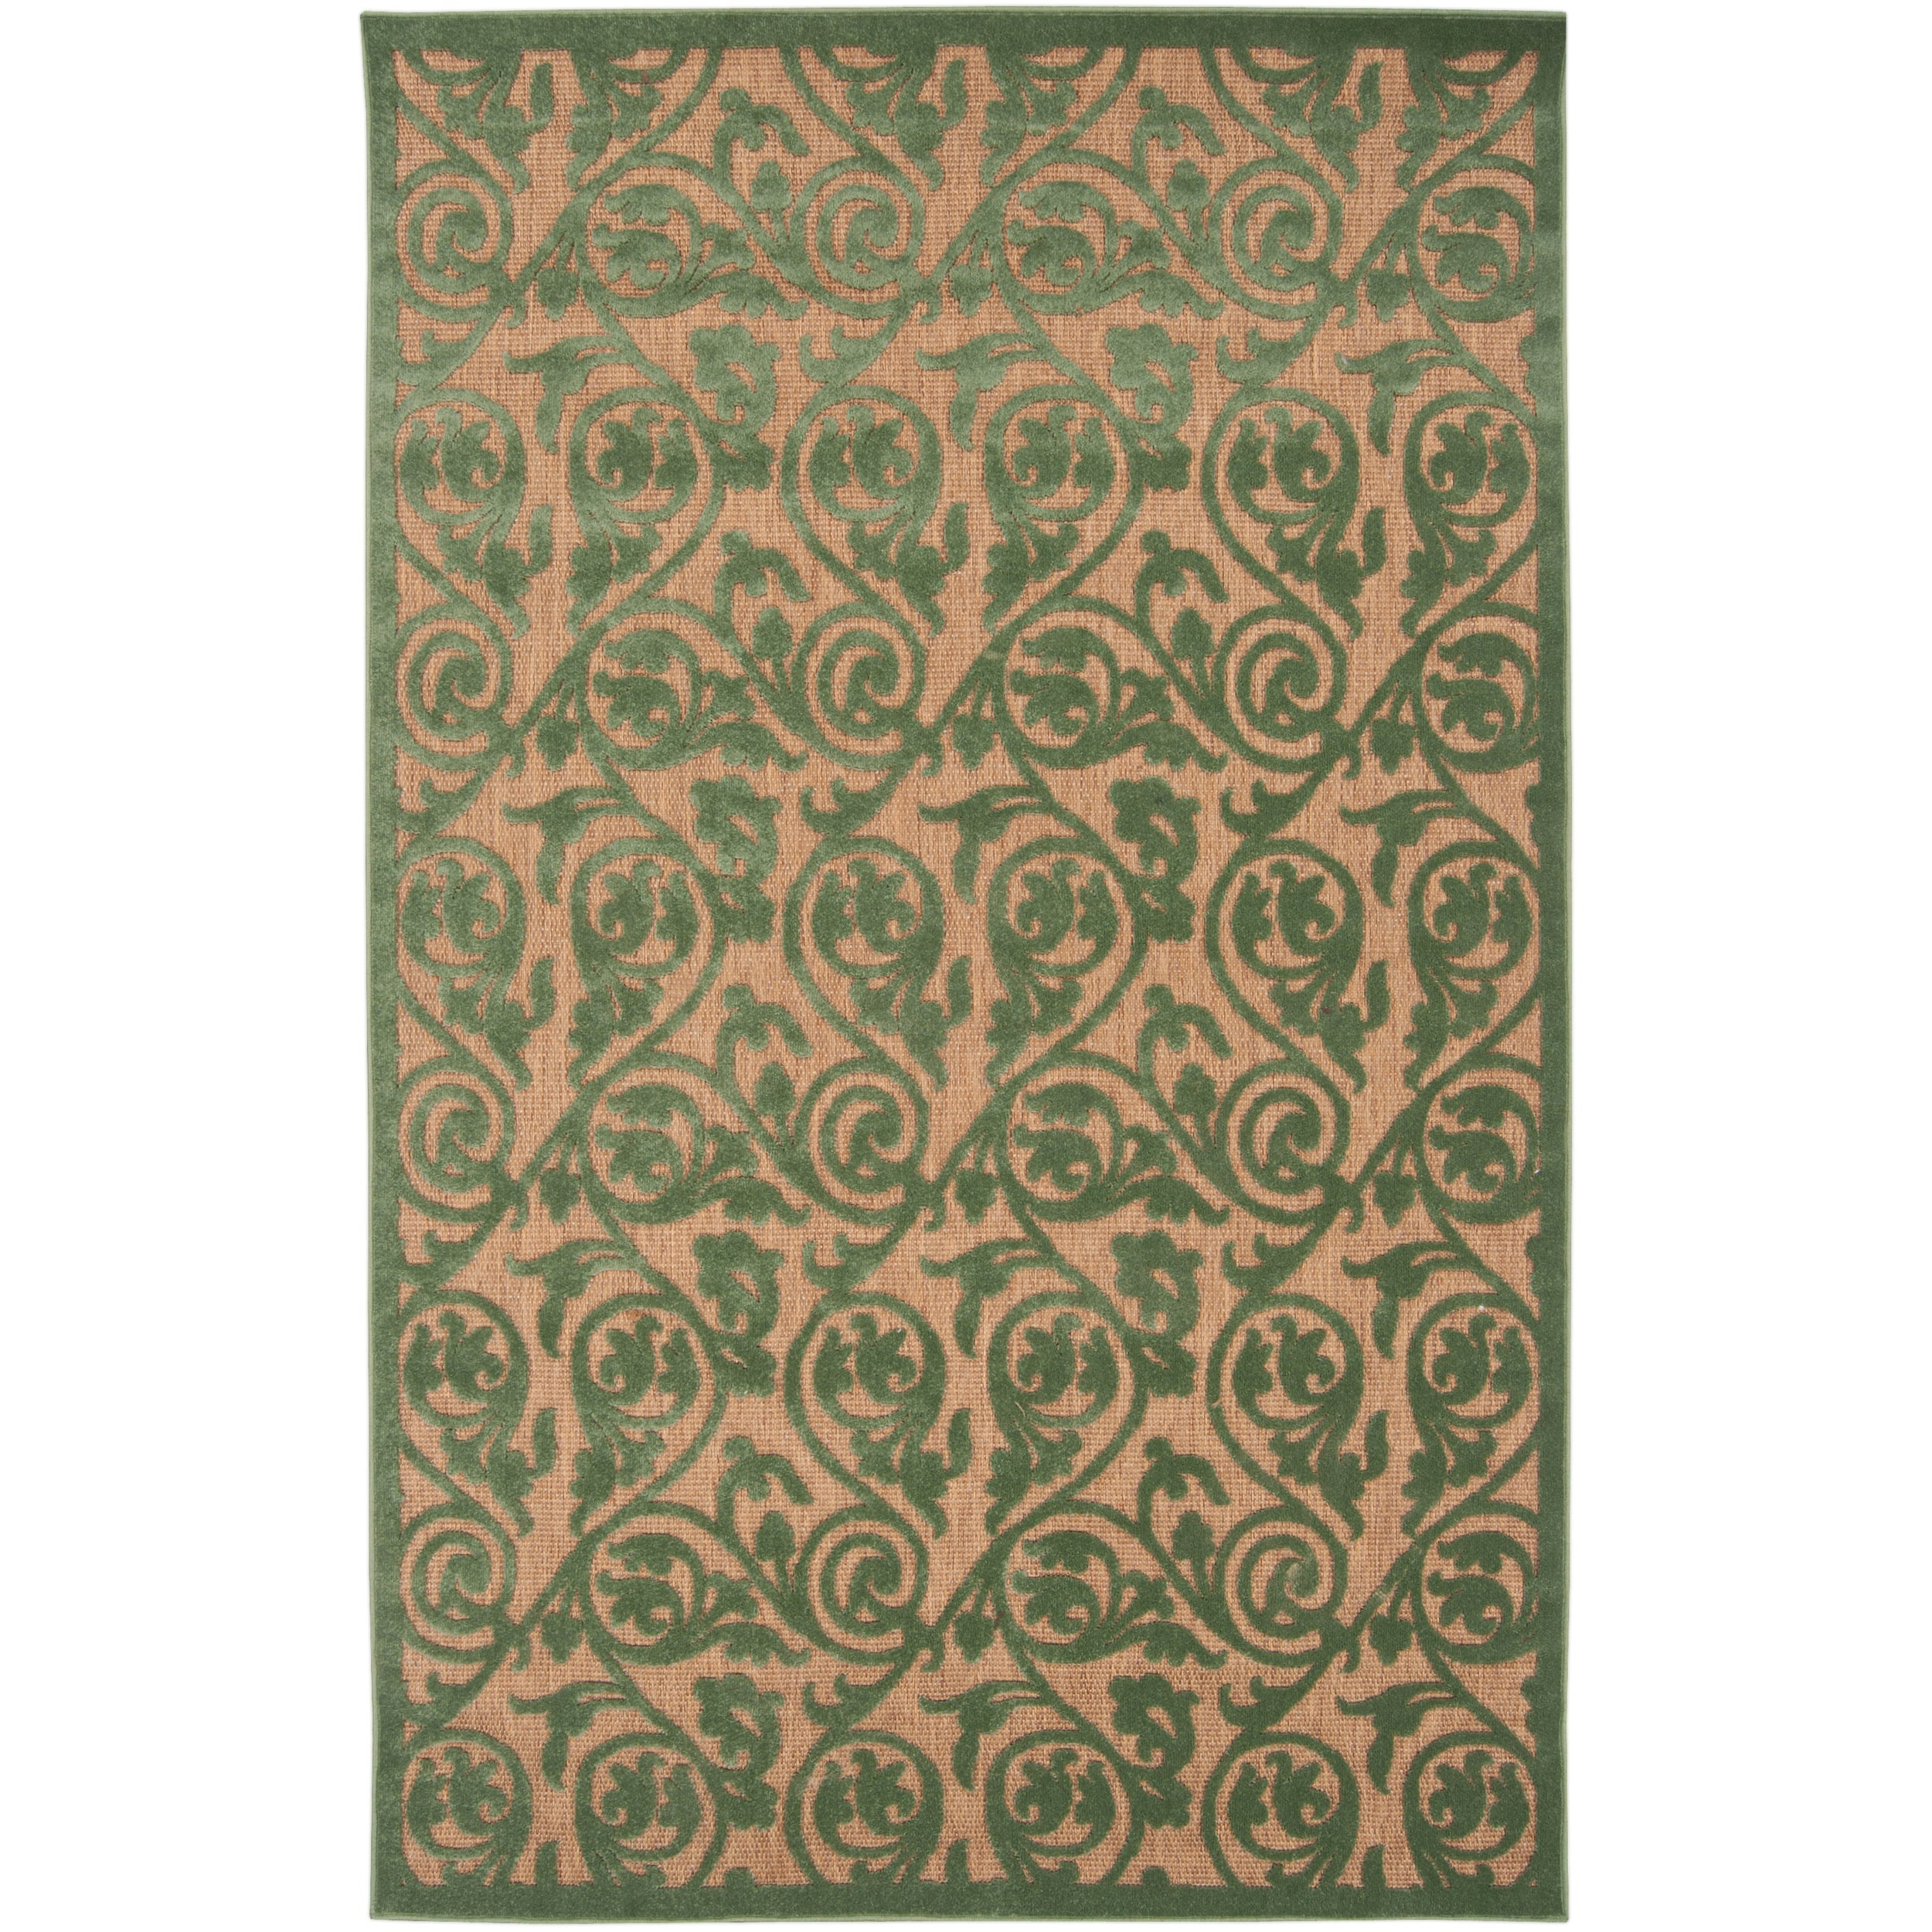 Woven Portera Indoor/Outdoor Floral Rug (7'10 x 10'8)